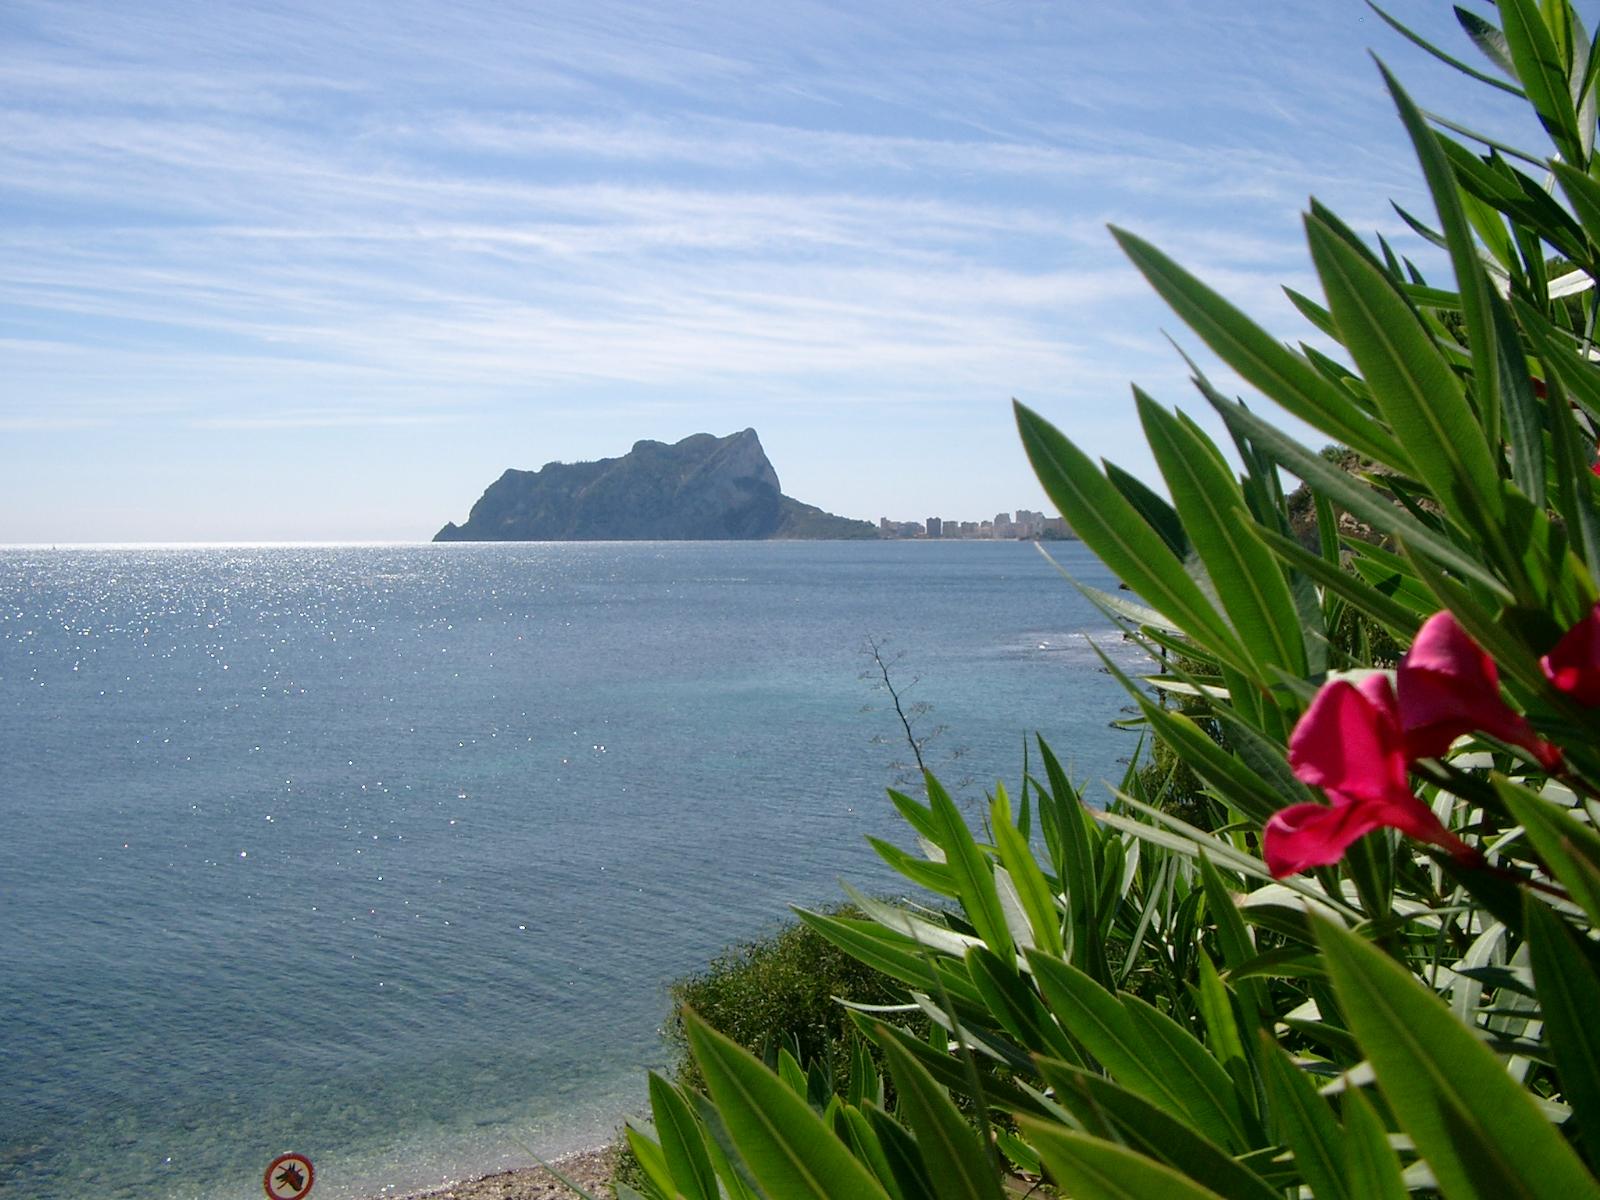 Foto playa Cala L'Advocat. Penon de Ifach vom Strand Baladrar - Benissa aus